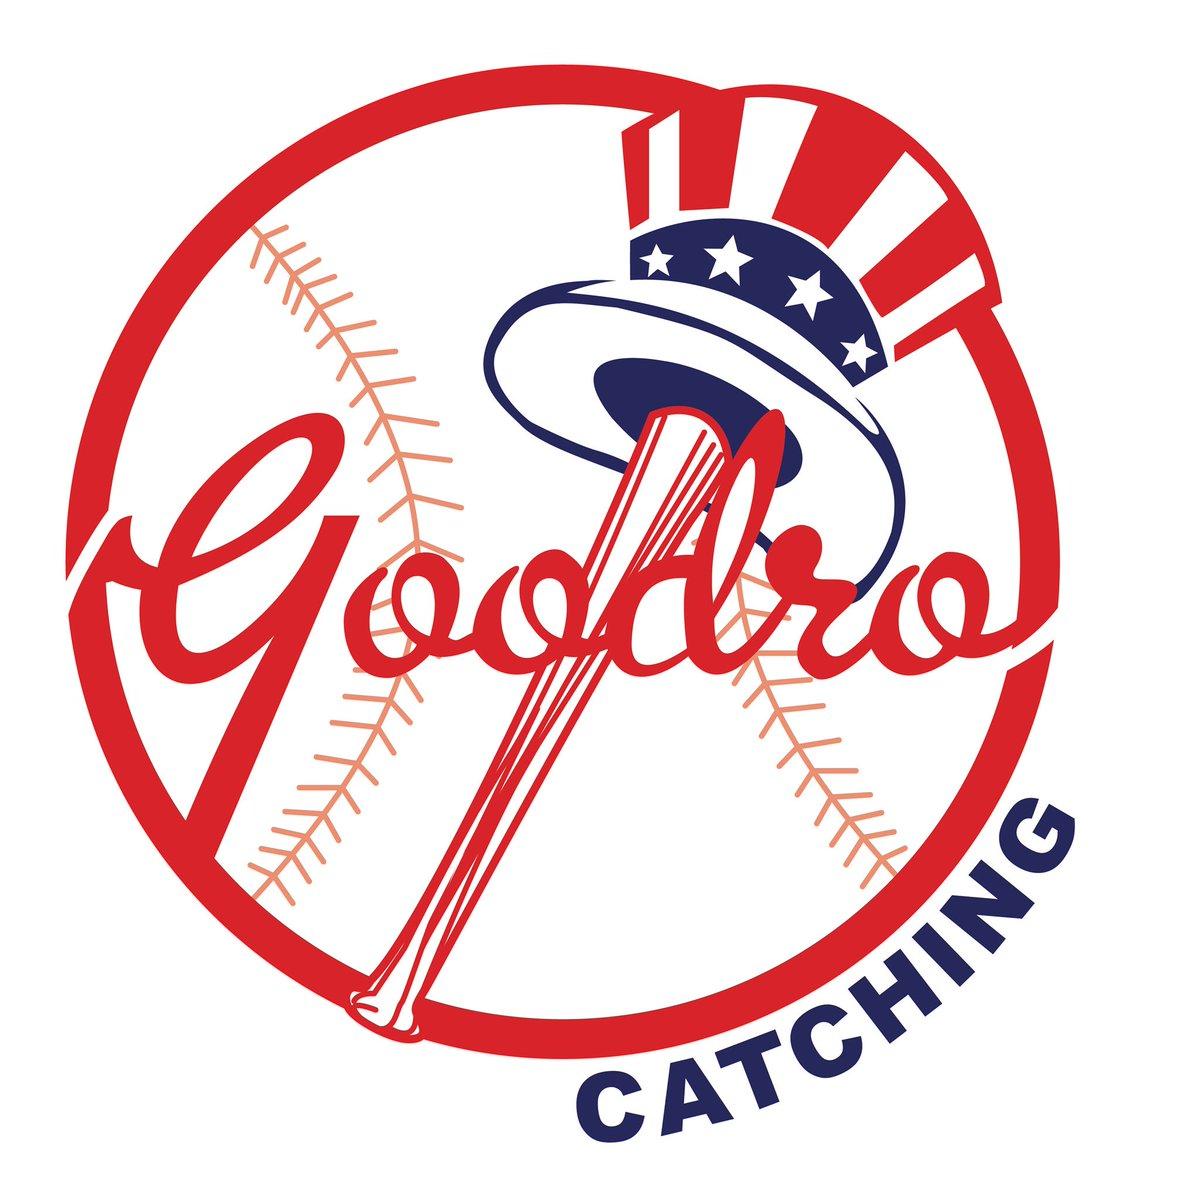 #PinstripePride #AlternateLogo #Yankees #GoodroCatching @TyGoodroCatch13pic.twitter.com/3htxB9DxoL